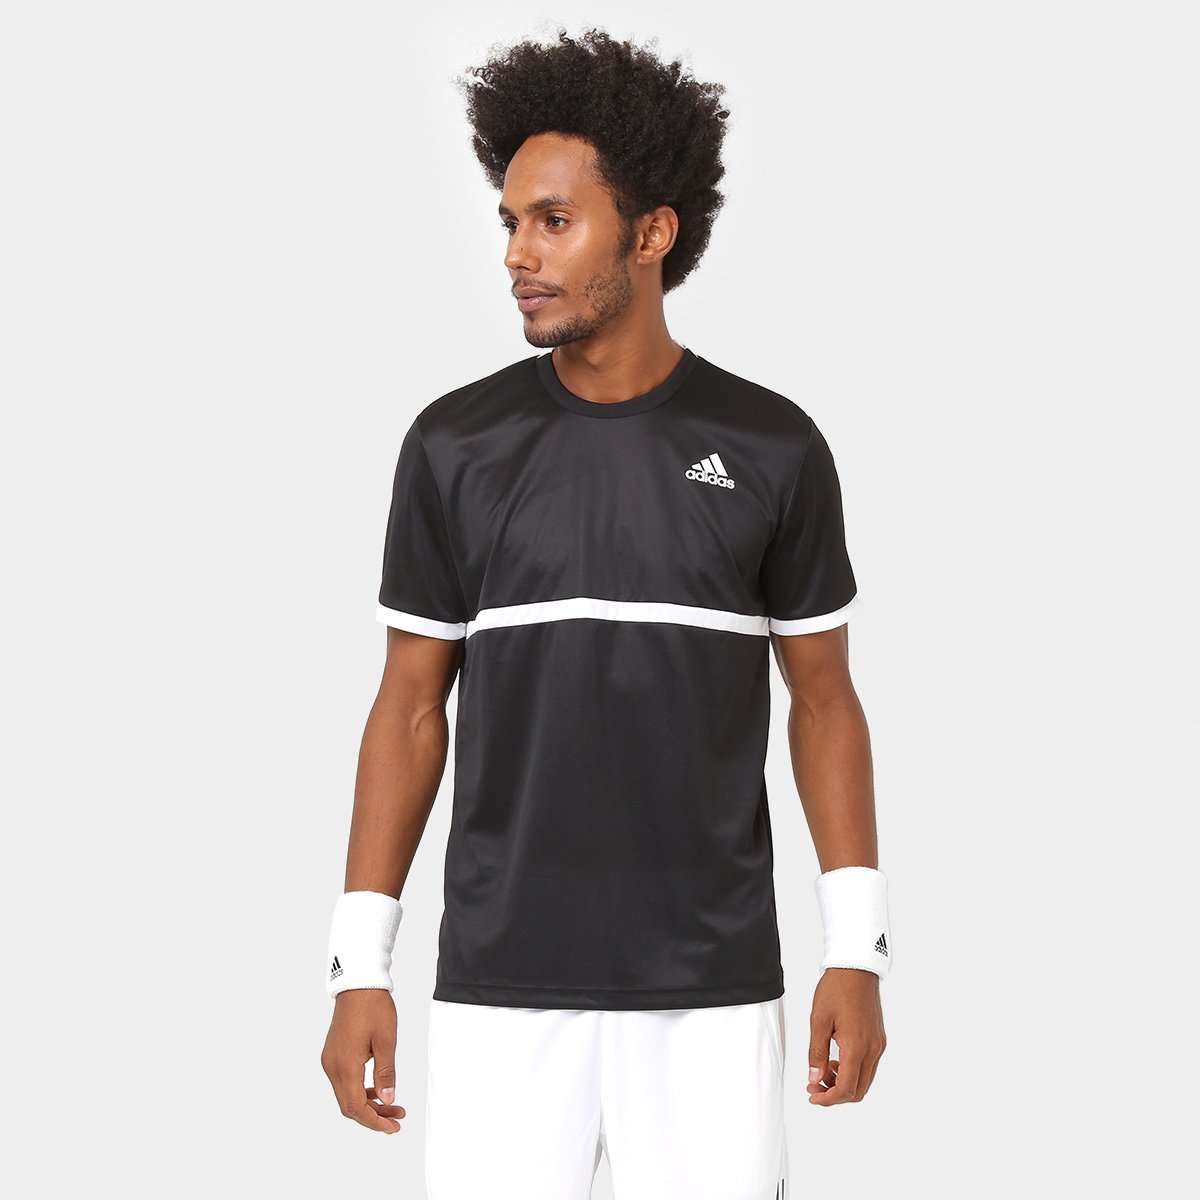 fb54d17f42 Compre Adidas Court Ace W Online